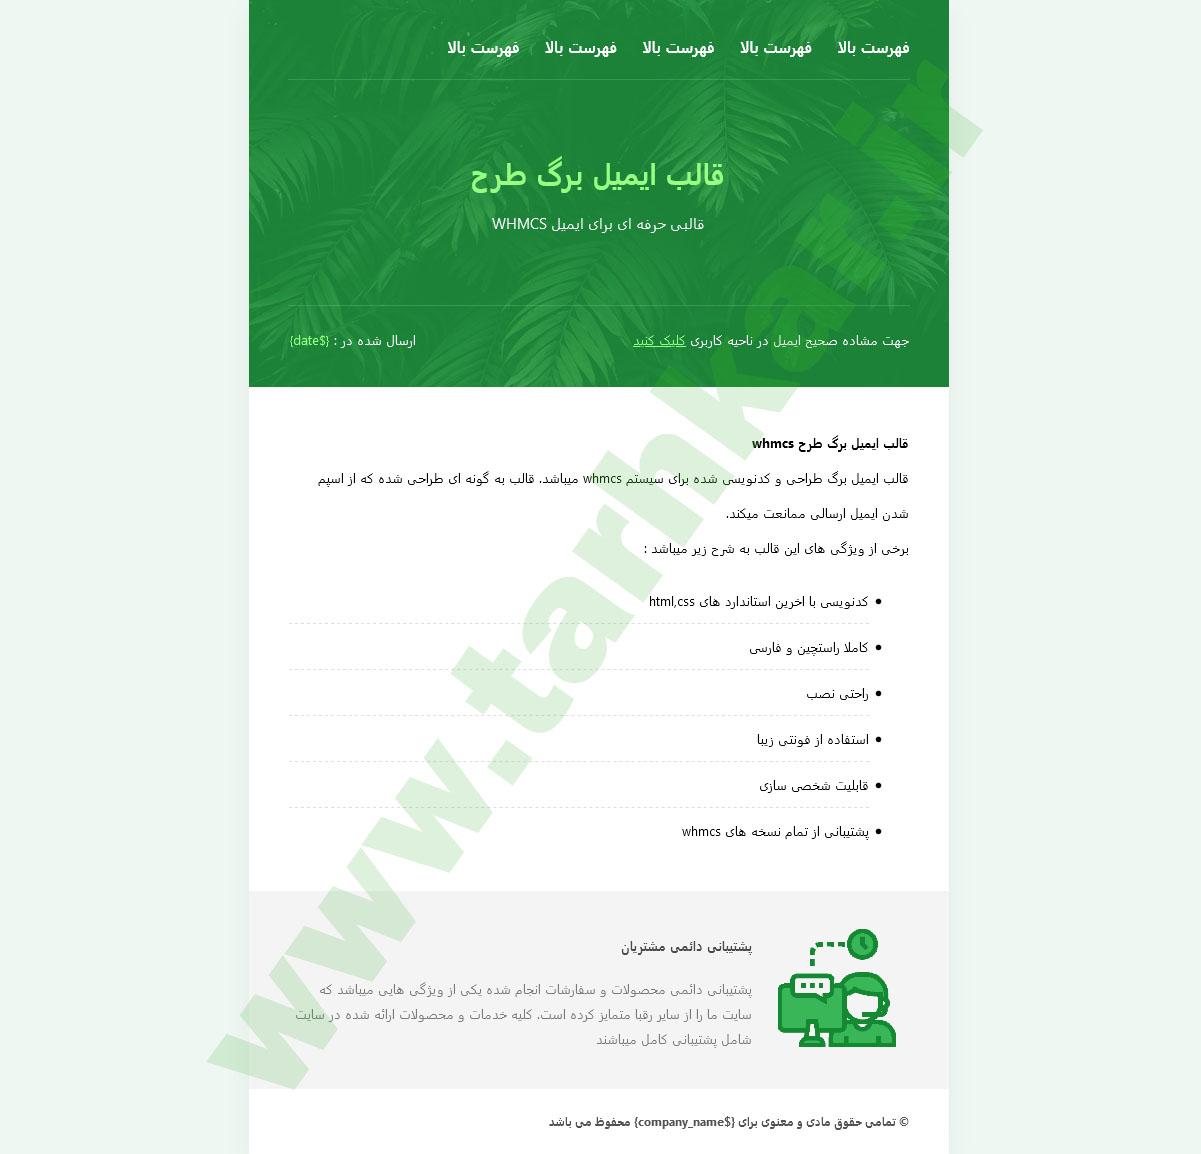 barg tarh3 - قالب ایمیل برگ طرح